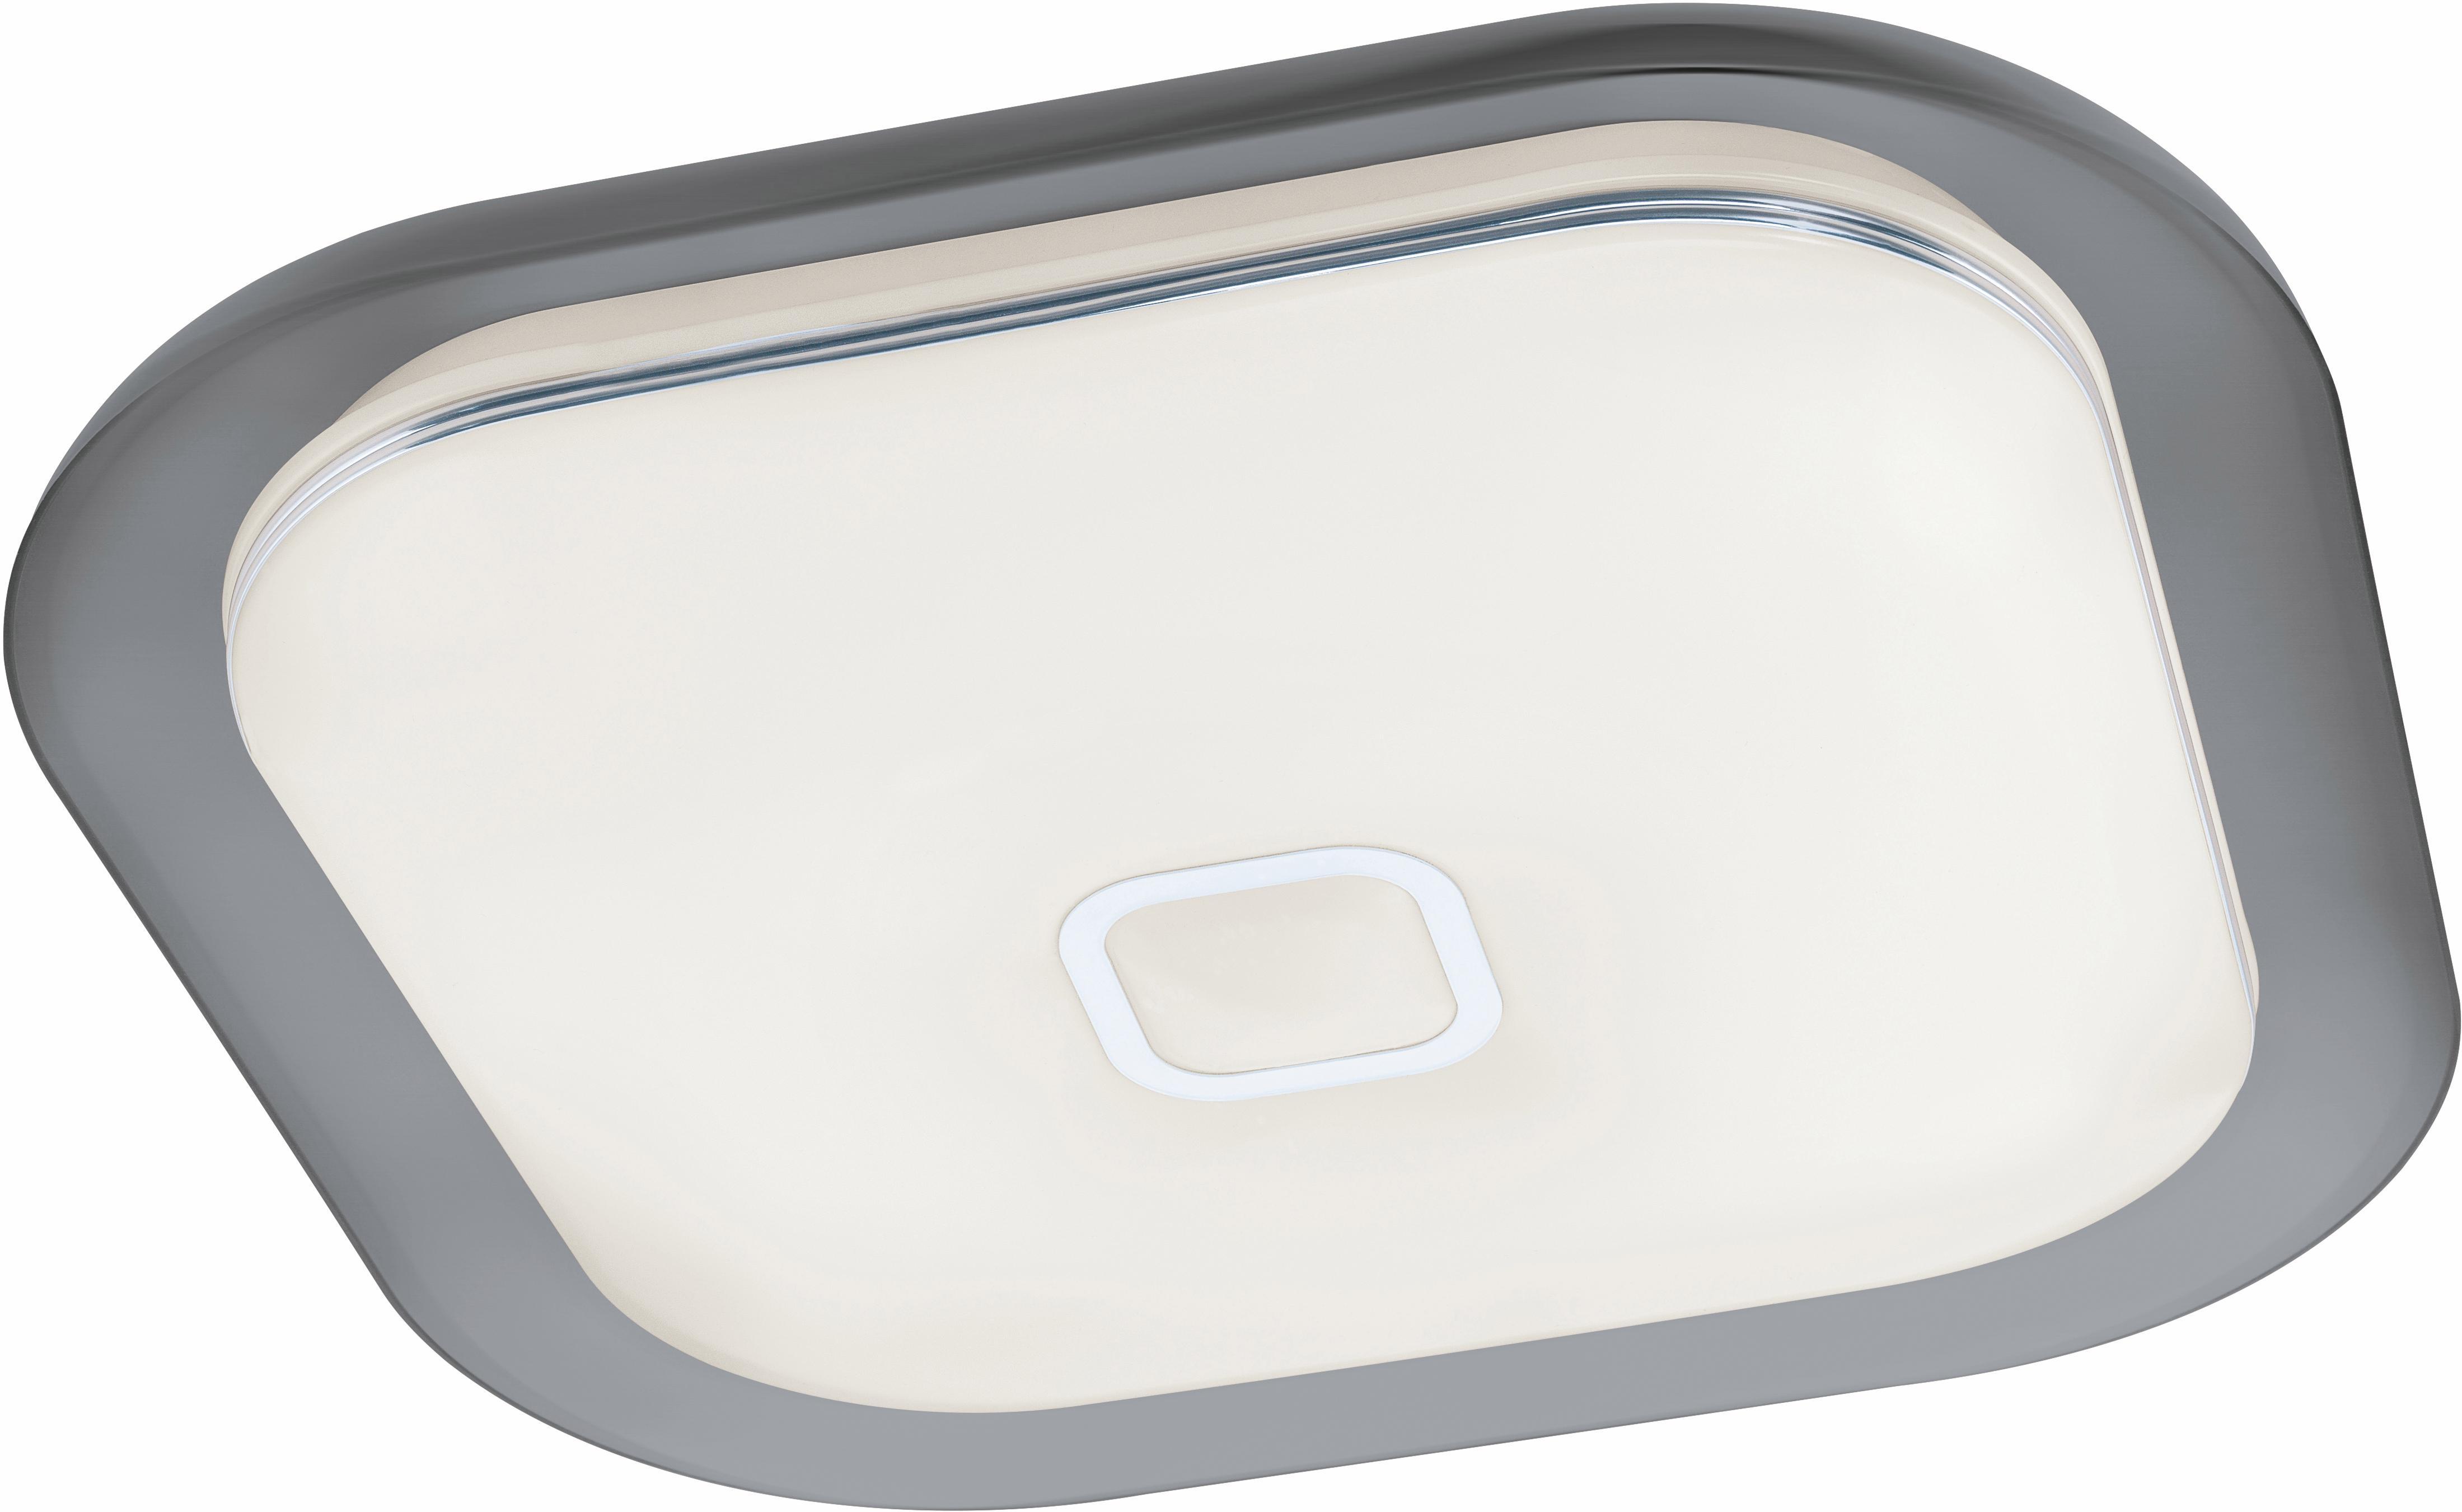 EGLO LED Deckenleuchte REGASOL, LED-Board, Extra-Warmweiß-Kaltweiß-Neutralweiß-Tageslichtweiß-Warmweiß, Memory function, CCT, 3-step dimming